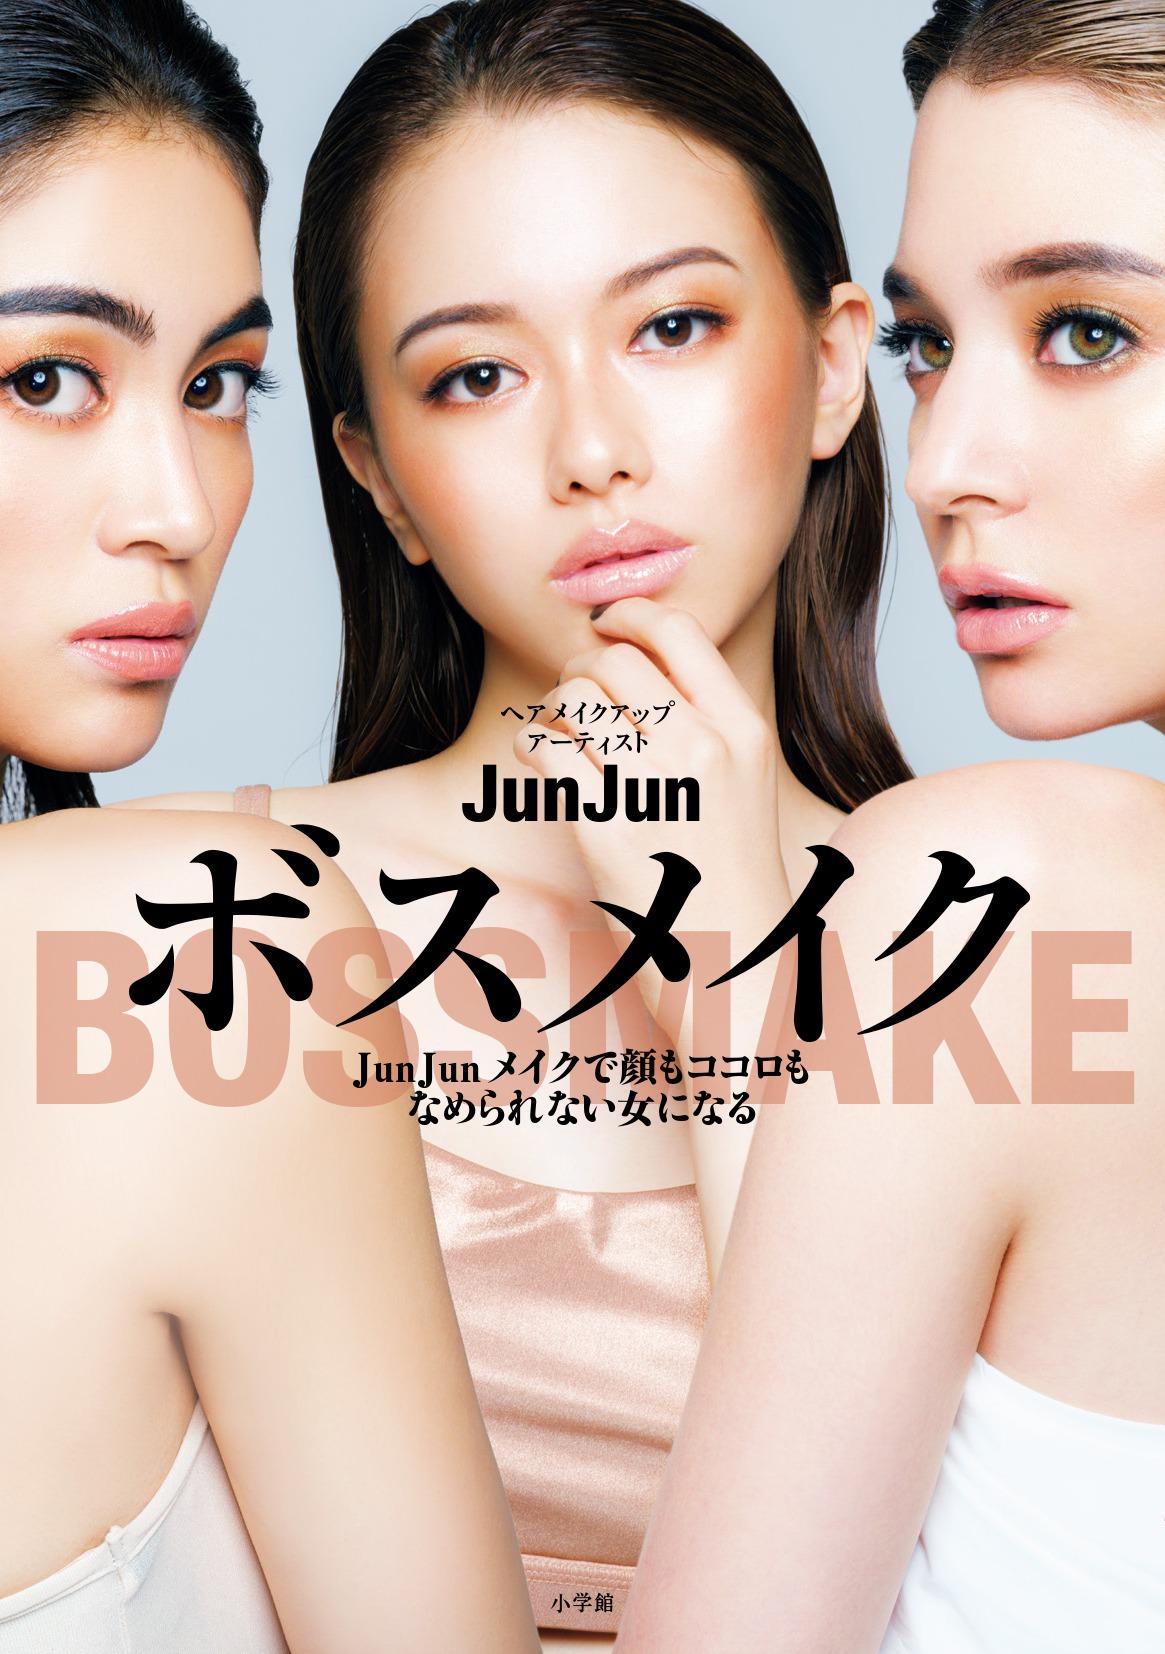 JunJun BOSSMAKE Tour 2019 6月7日(金)東京公演